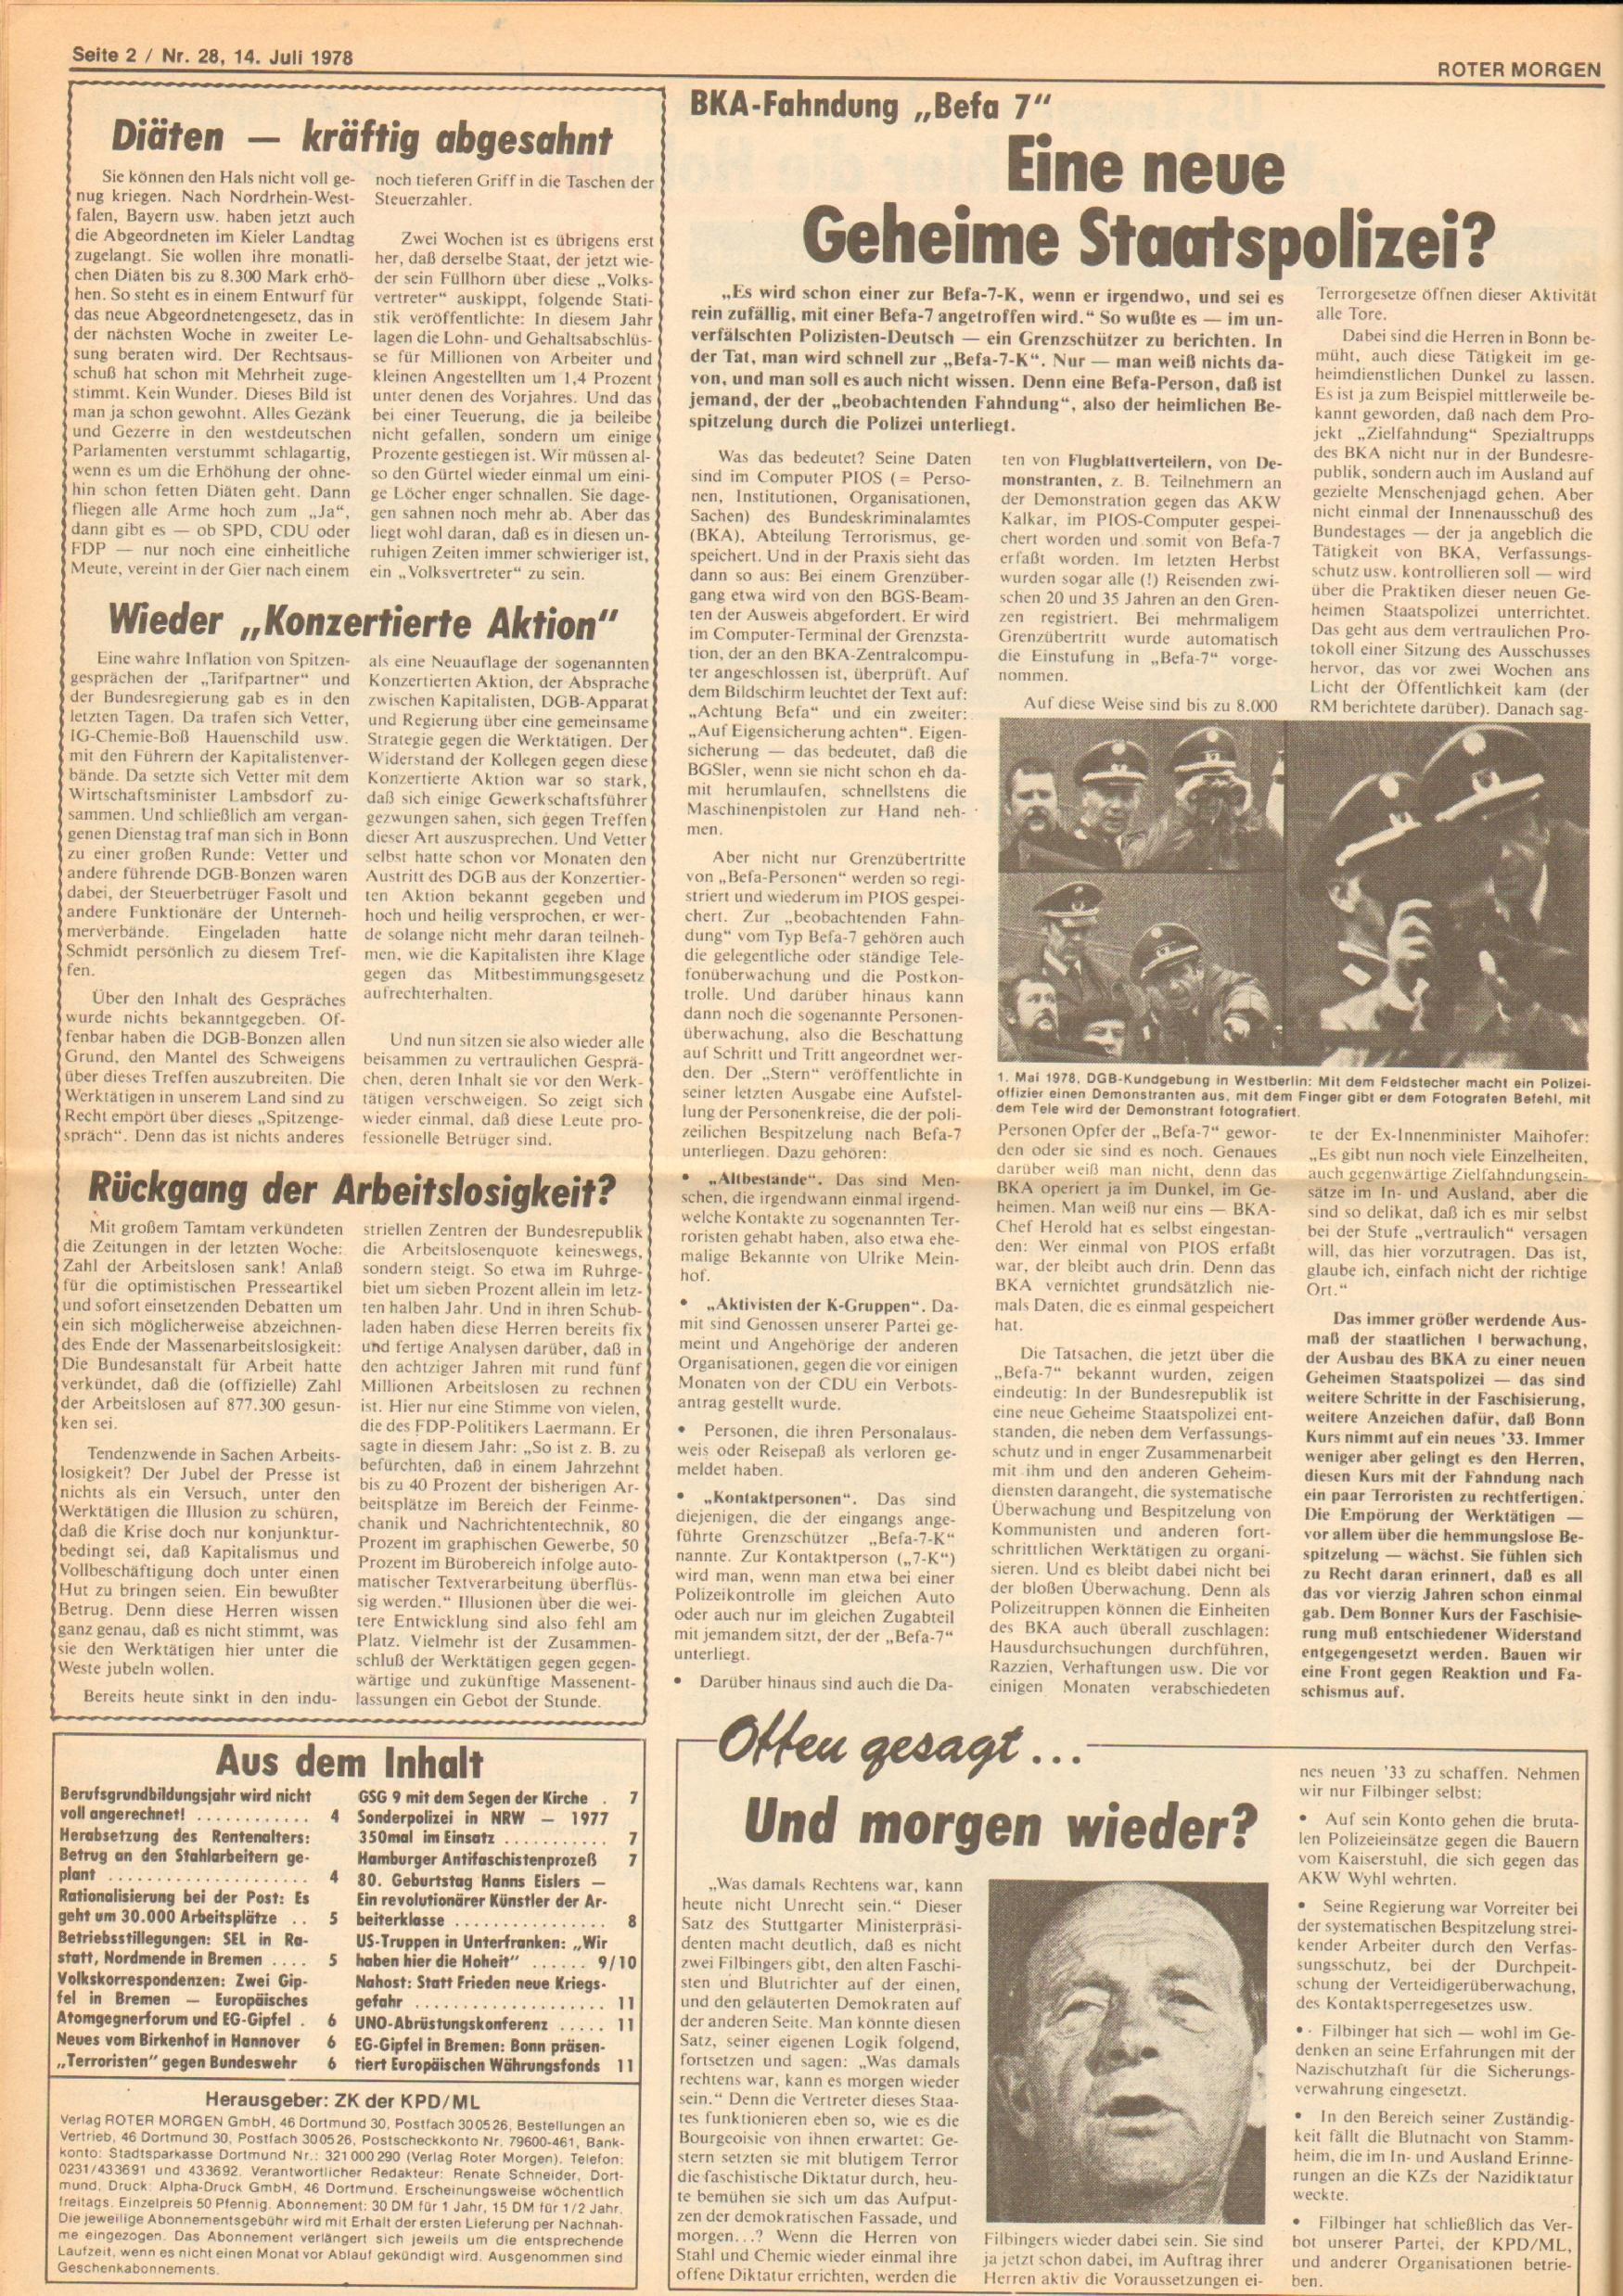 Roter Morgen, 12. Jg., 16. Juli 1978, Nr. 28, Seite 2